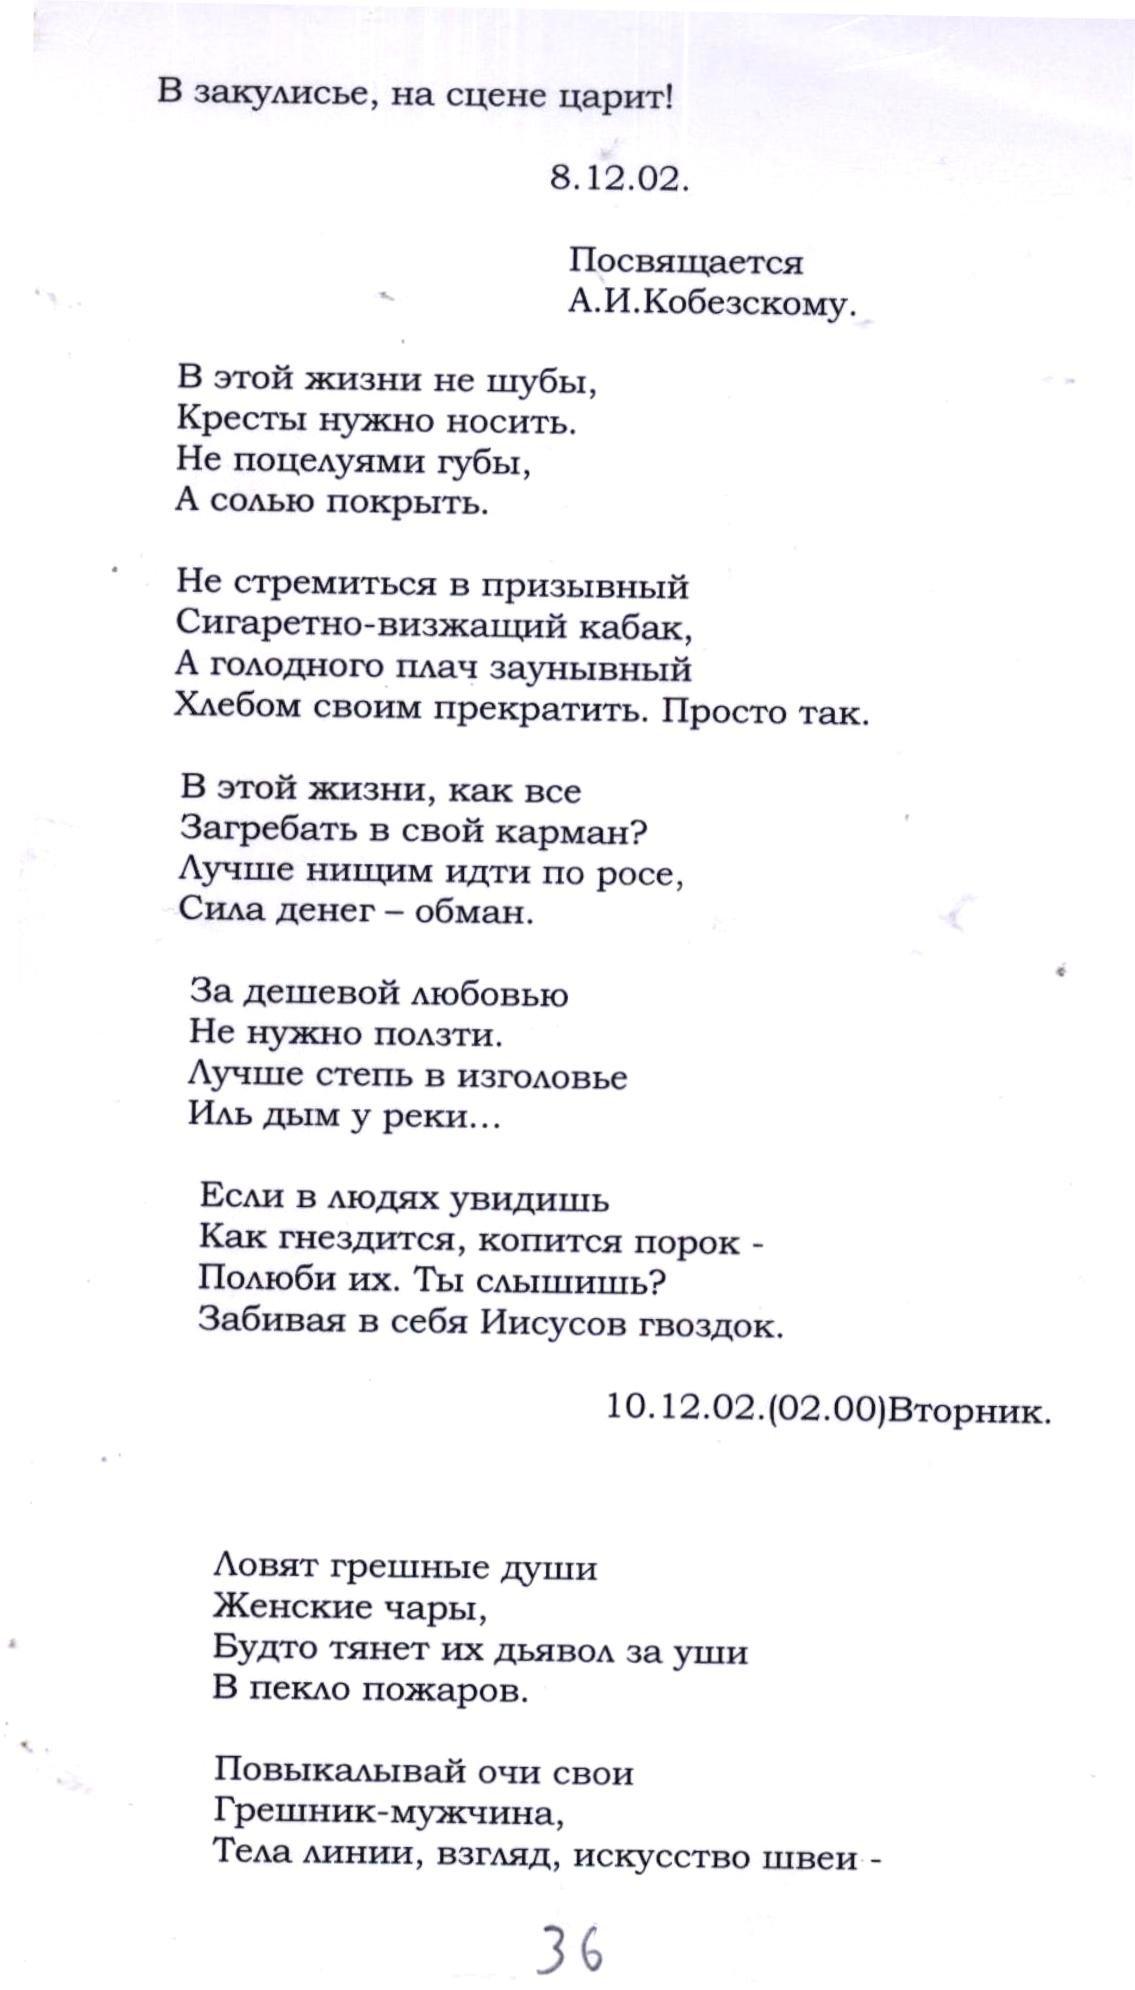 Стихи 035.jpg